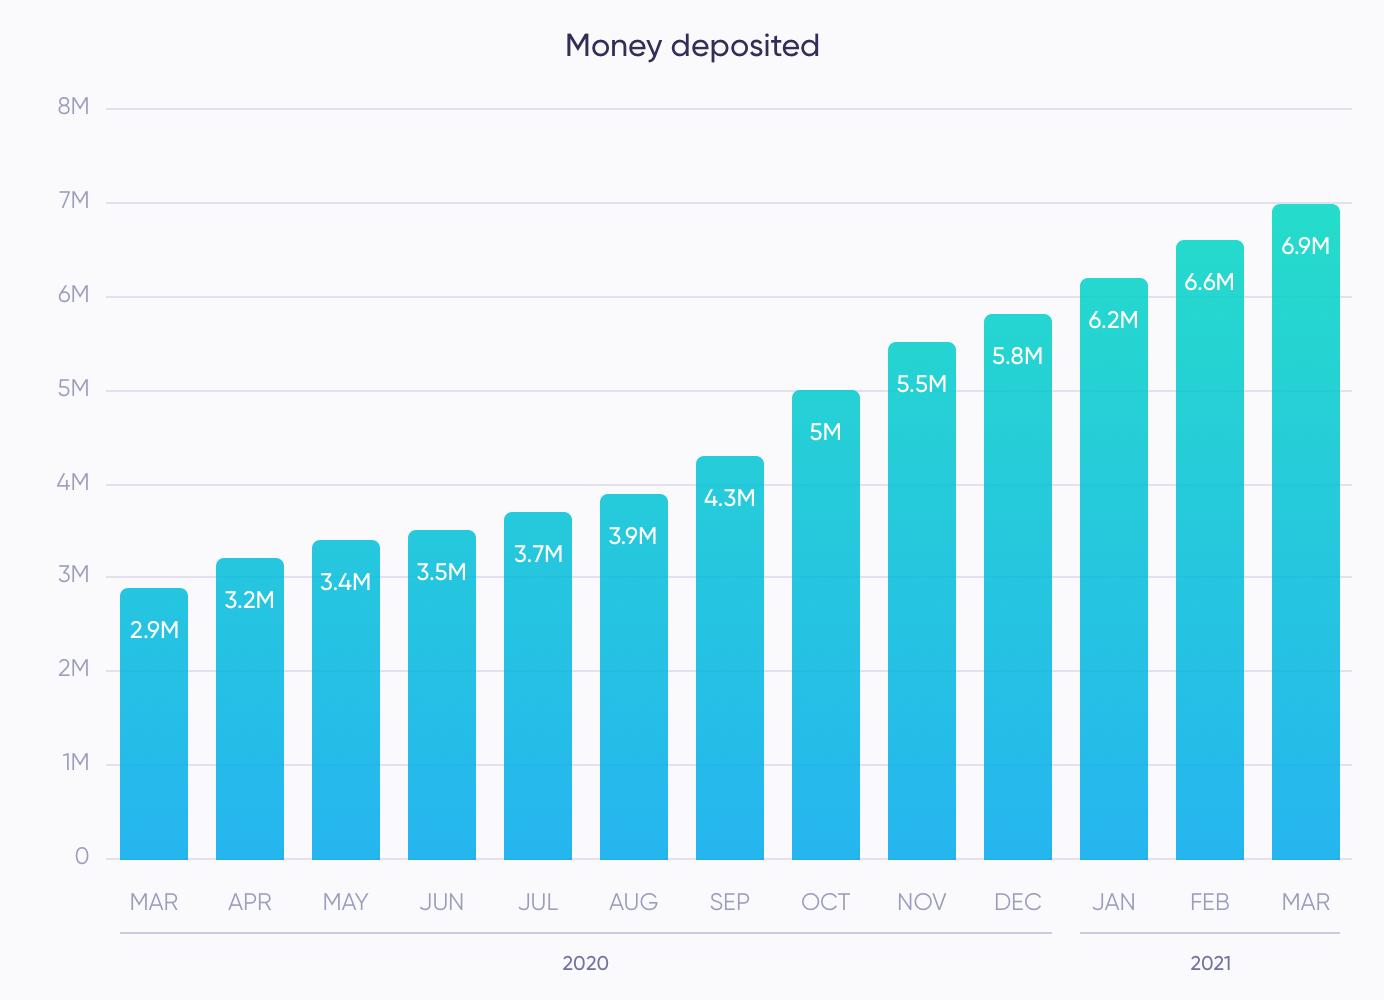 Money deposited on Debitum Network from Mar 20 - Mar 21